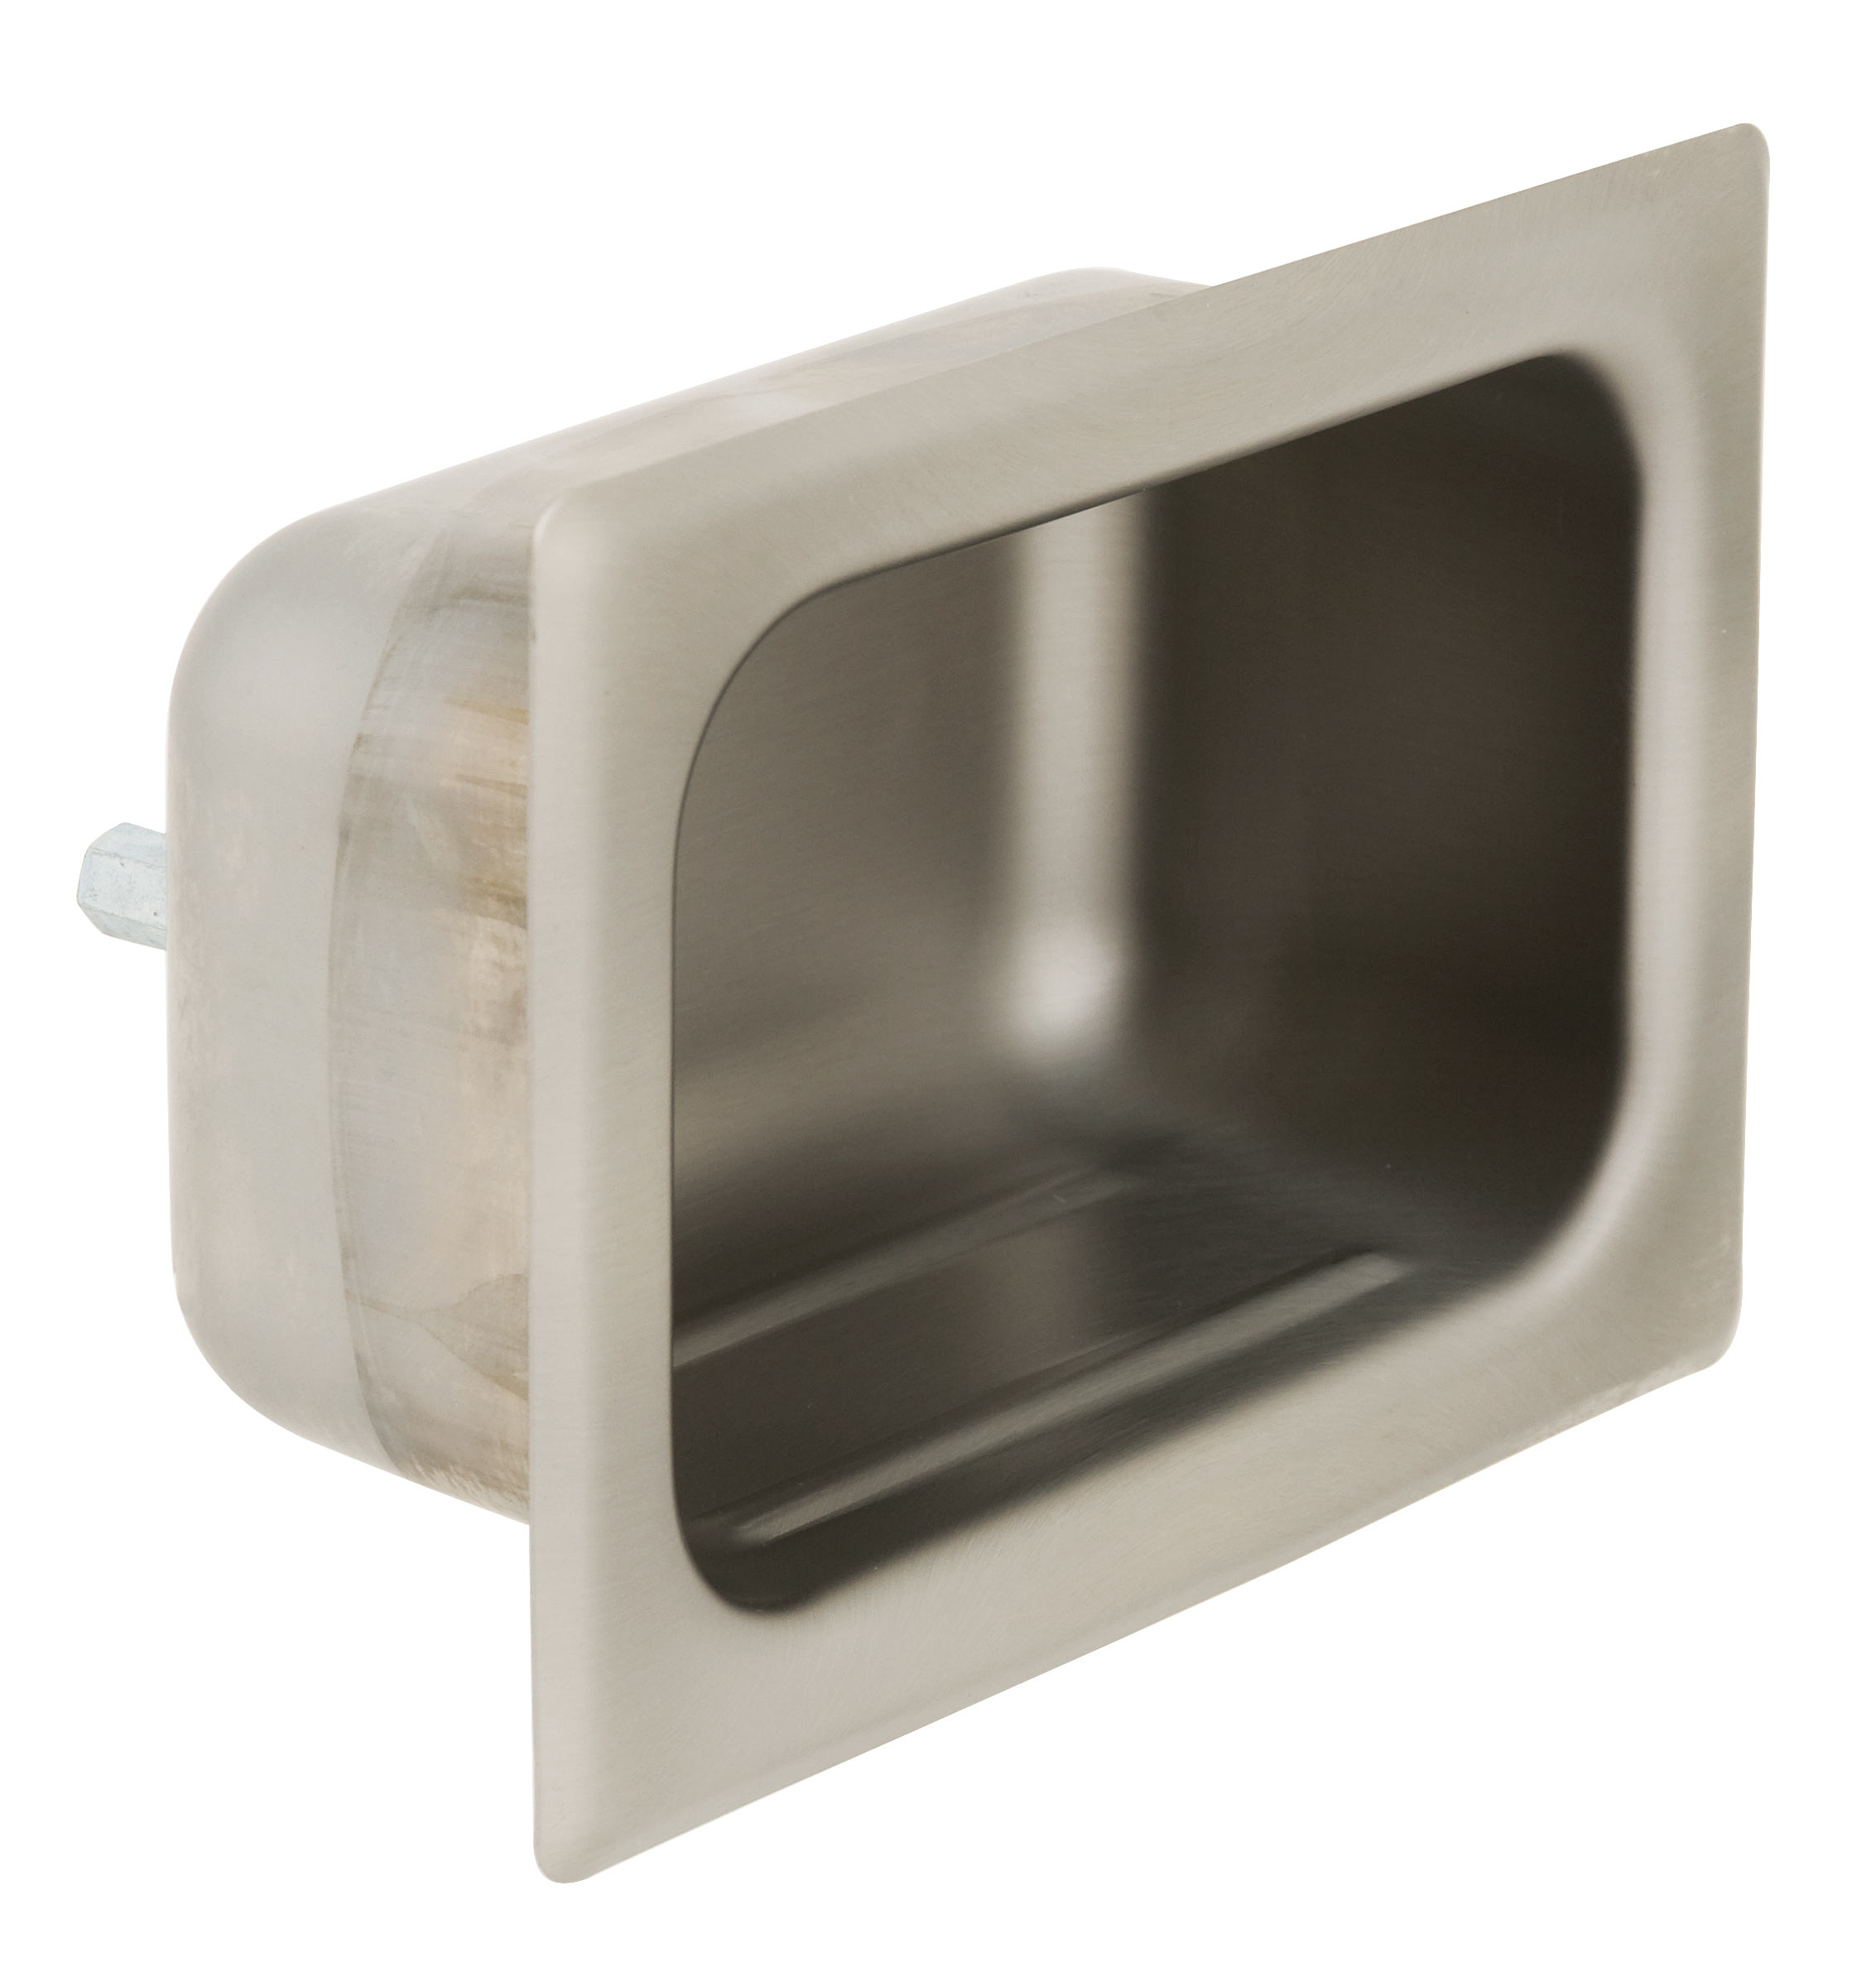 Bradley SA16 Security Soap Dish - Chase Mounted